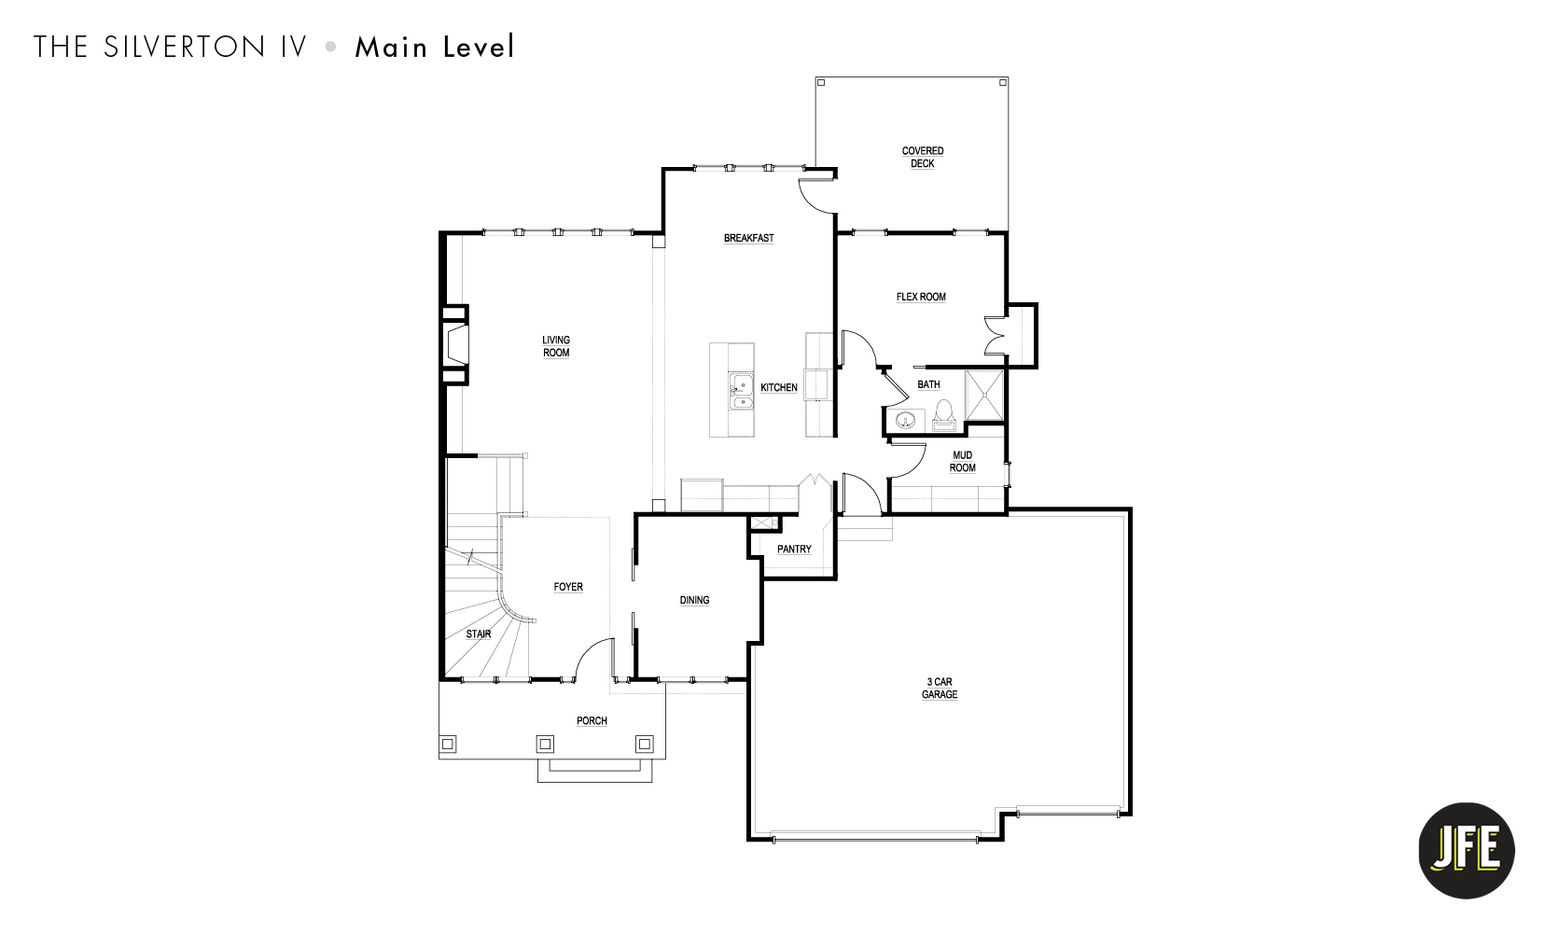 The-Silverton-IV-Main-Level.jpg